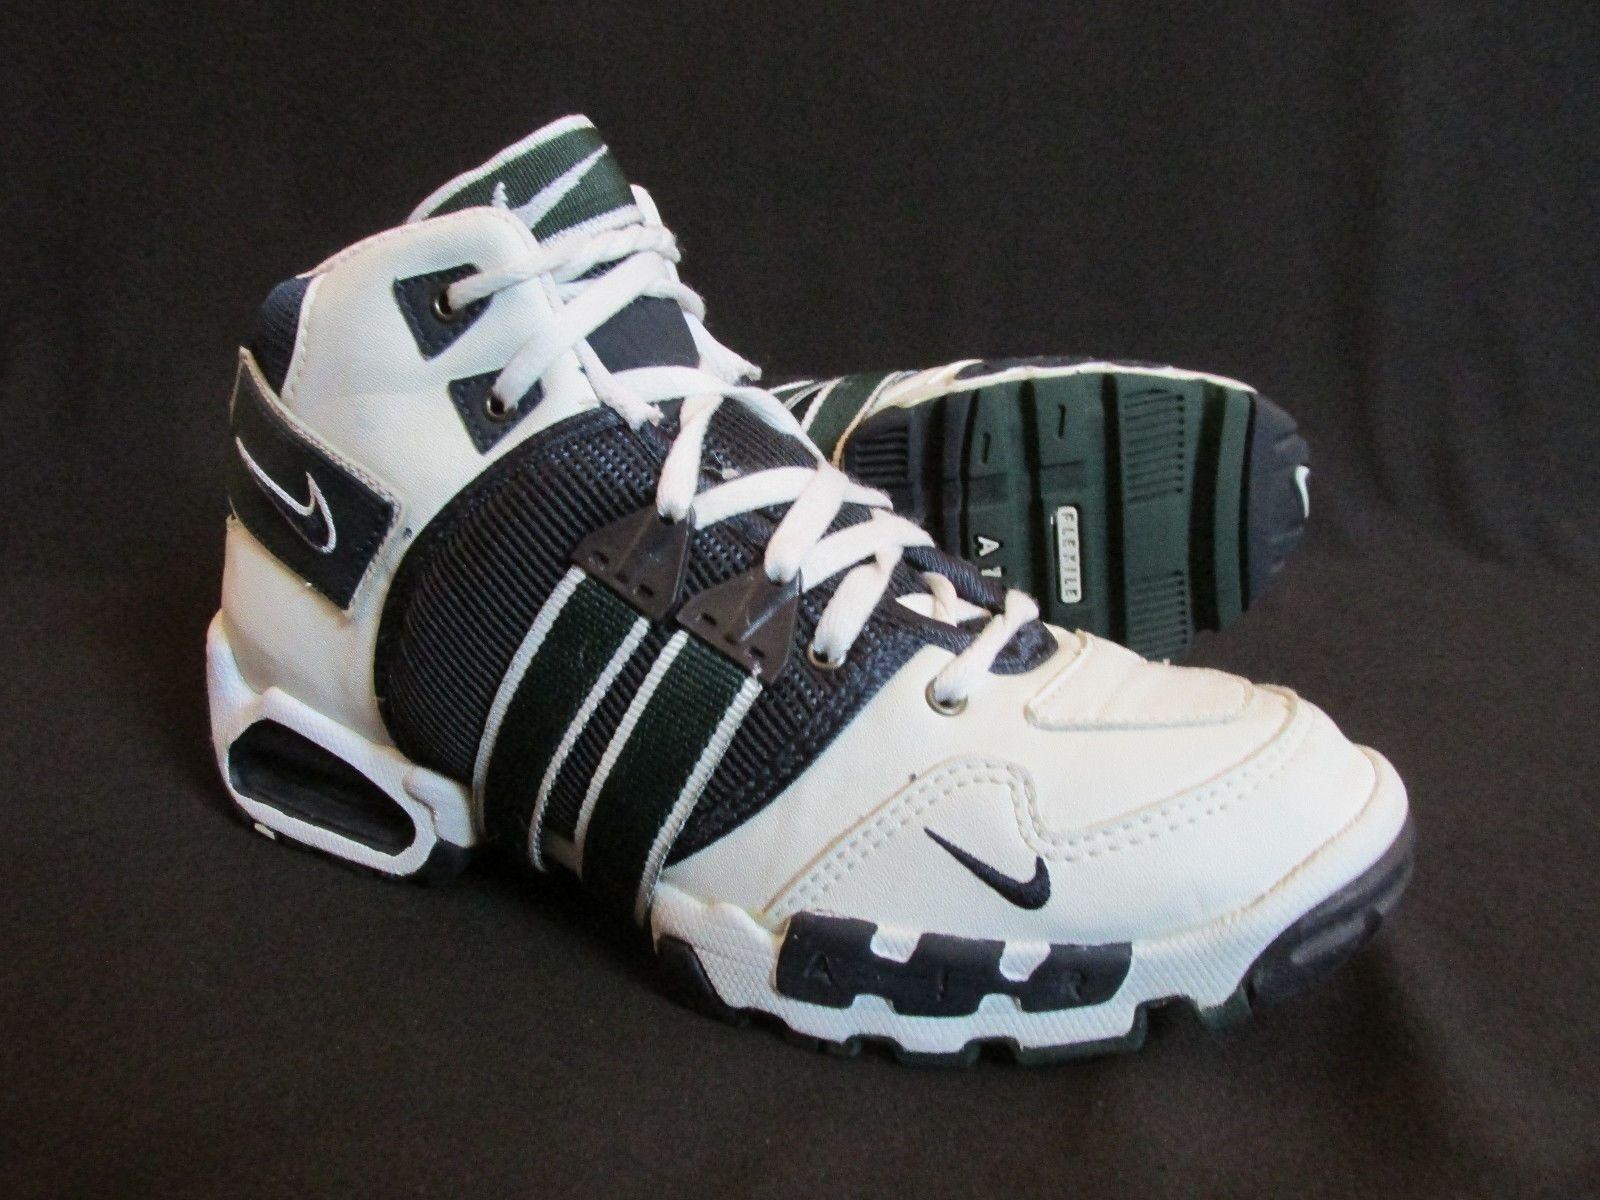 Nike air max thea lotc qs nero / bianco nero 847072-001 donne